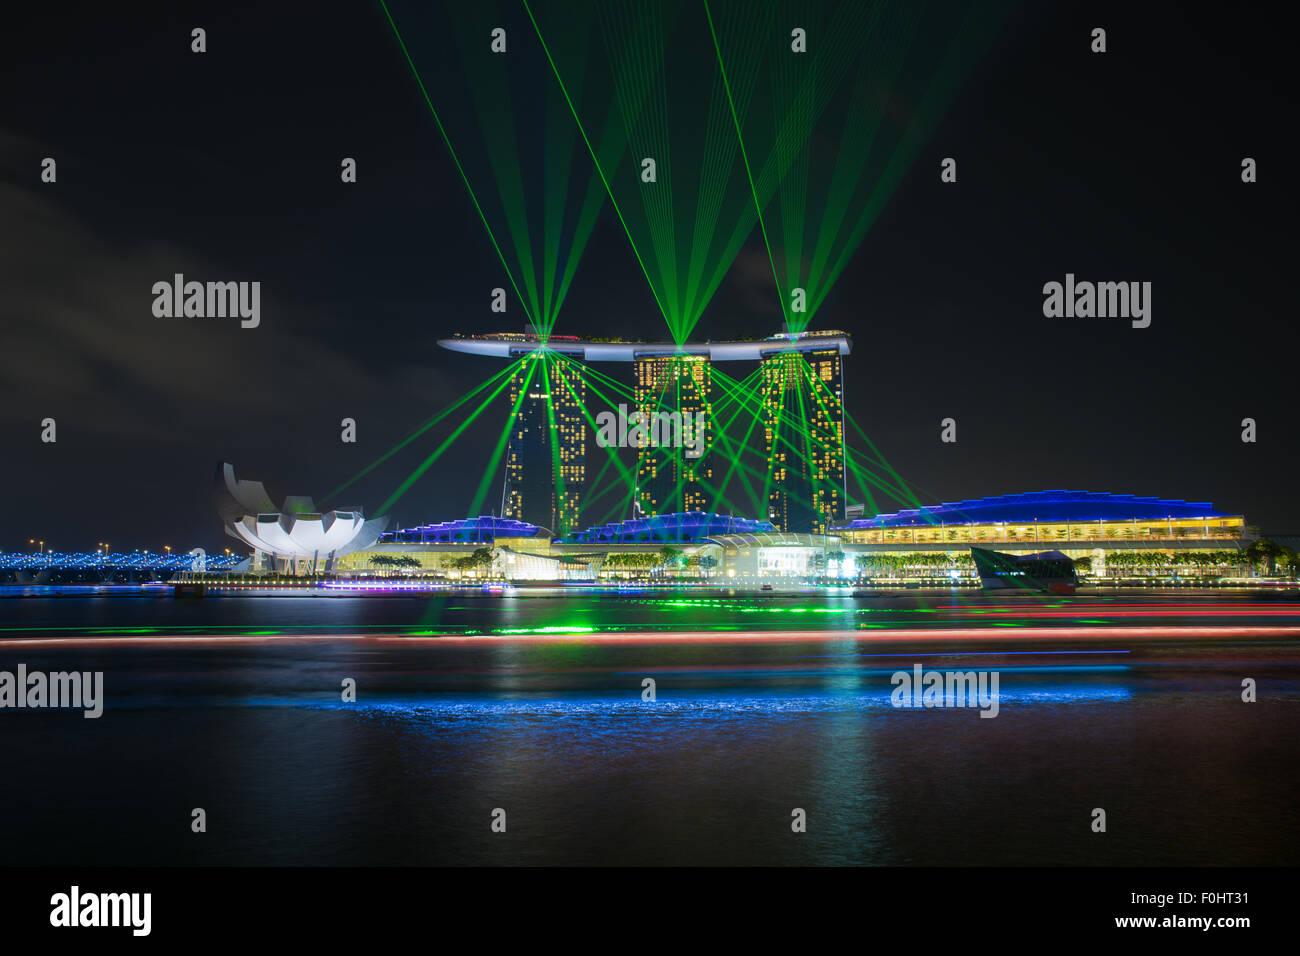 Laser show di Singapore Marina Bay, Singapore Immagini Stock